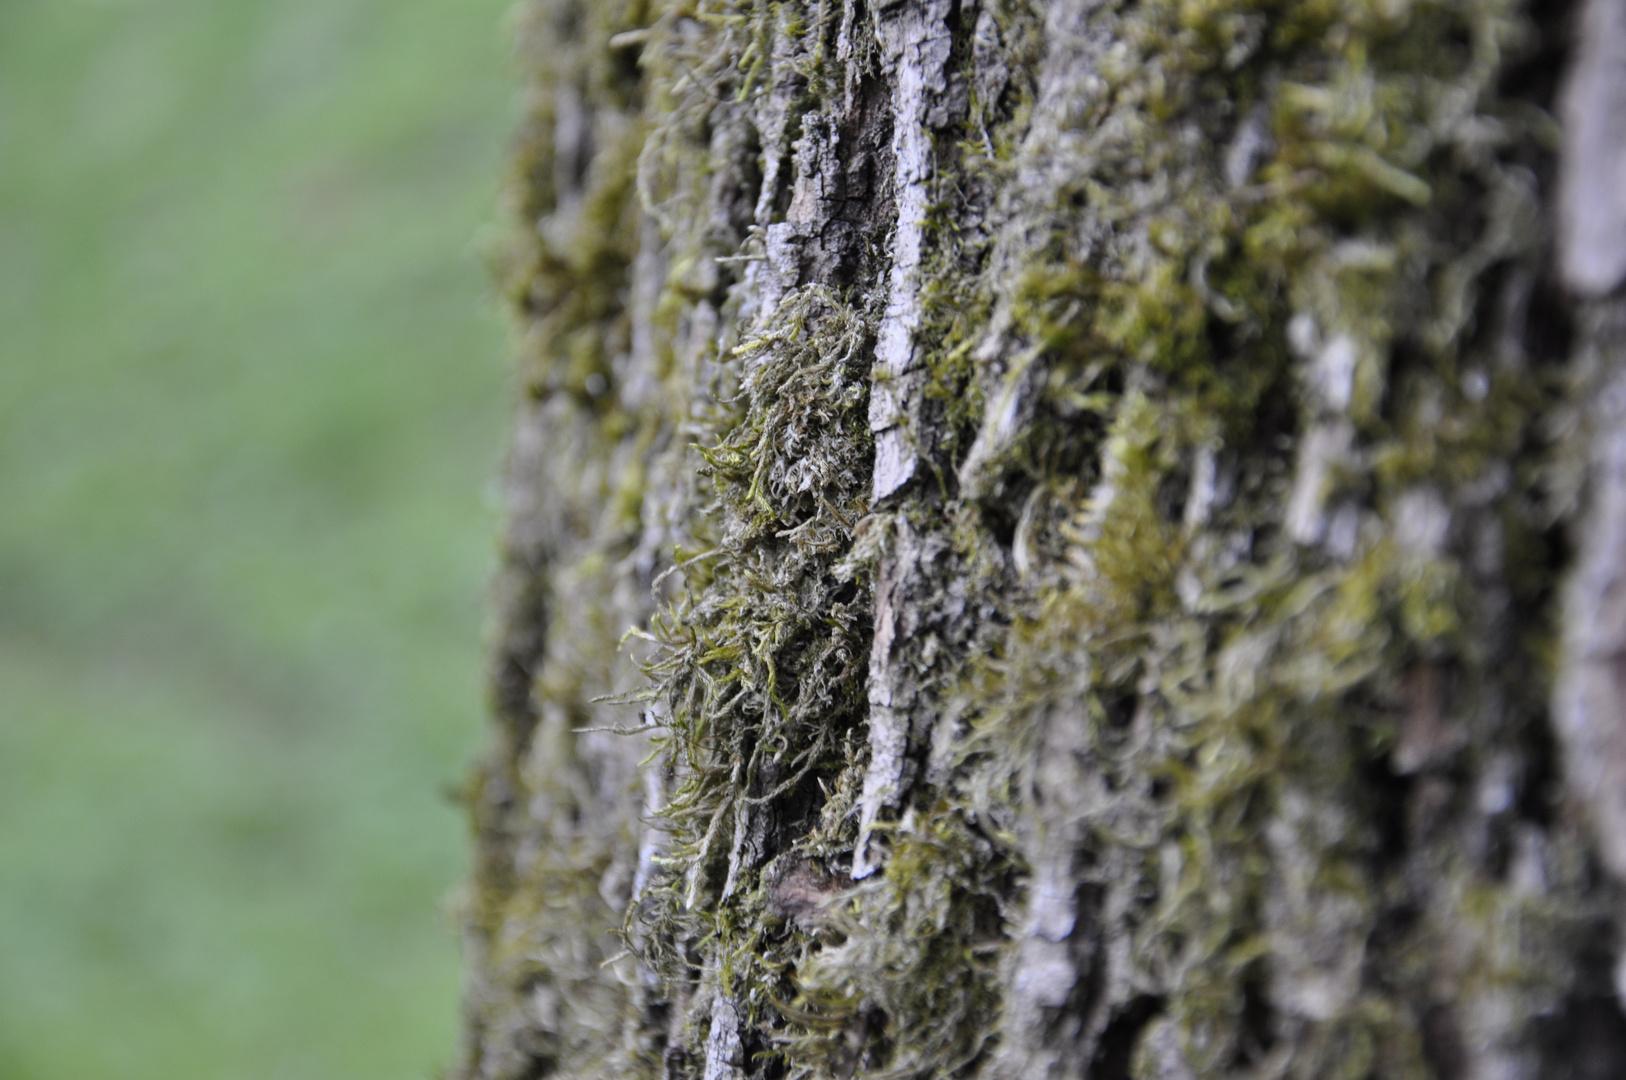 haariger alter Baum